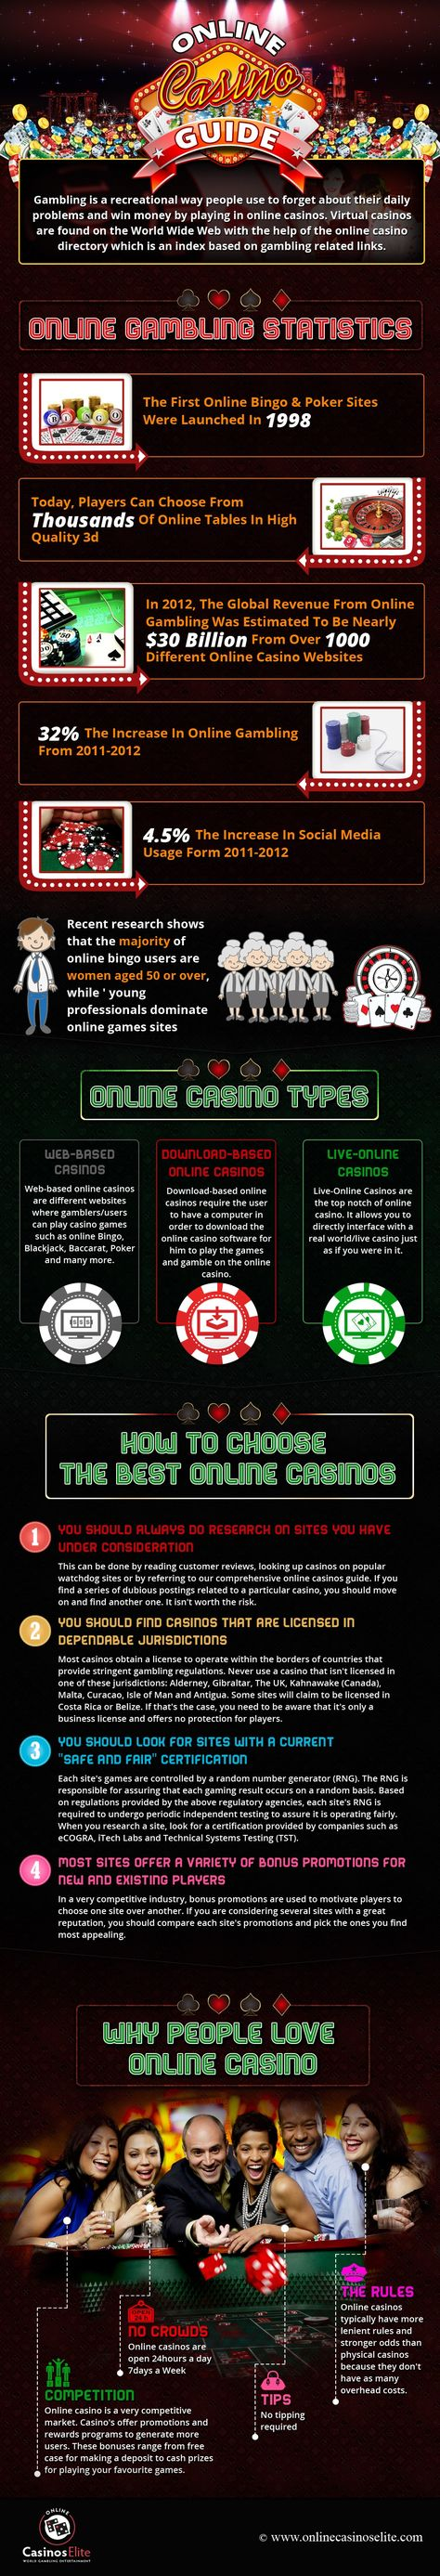 casino free ship codes